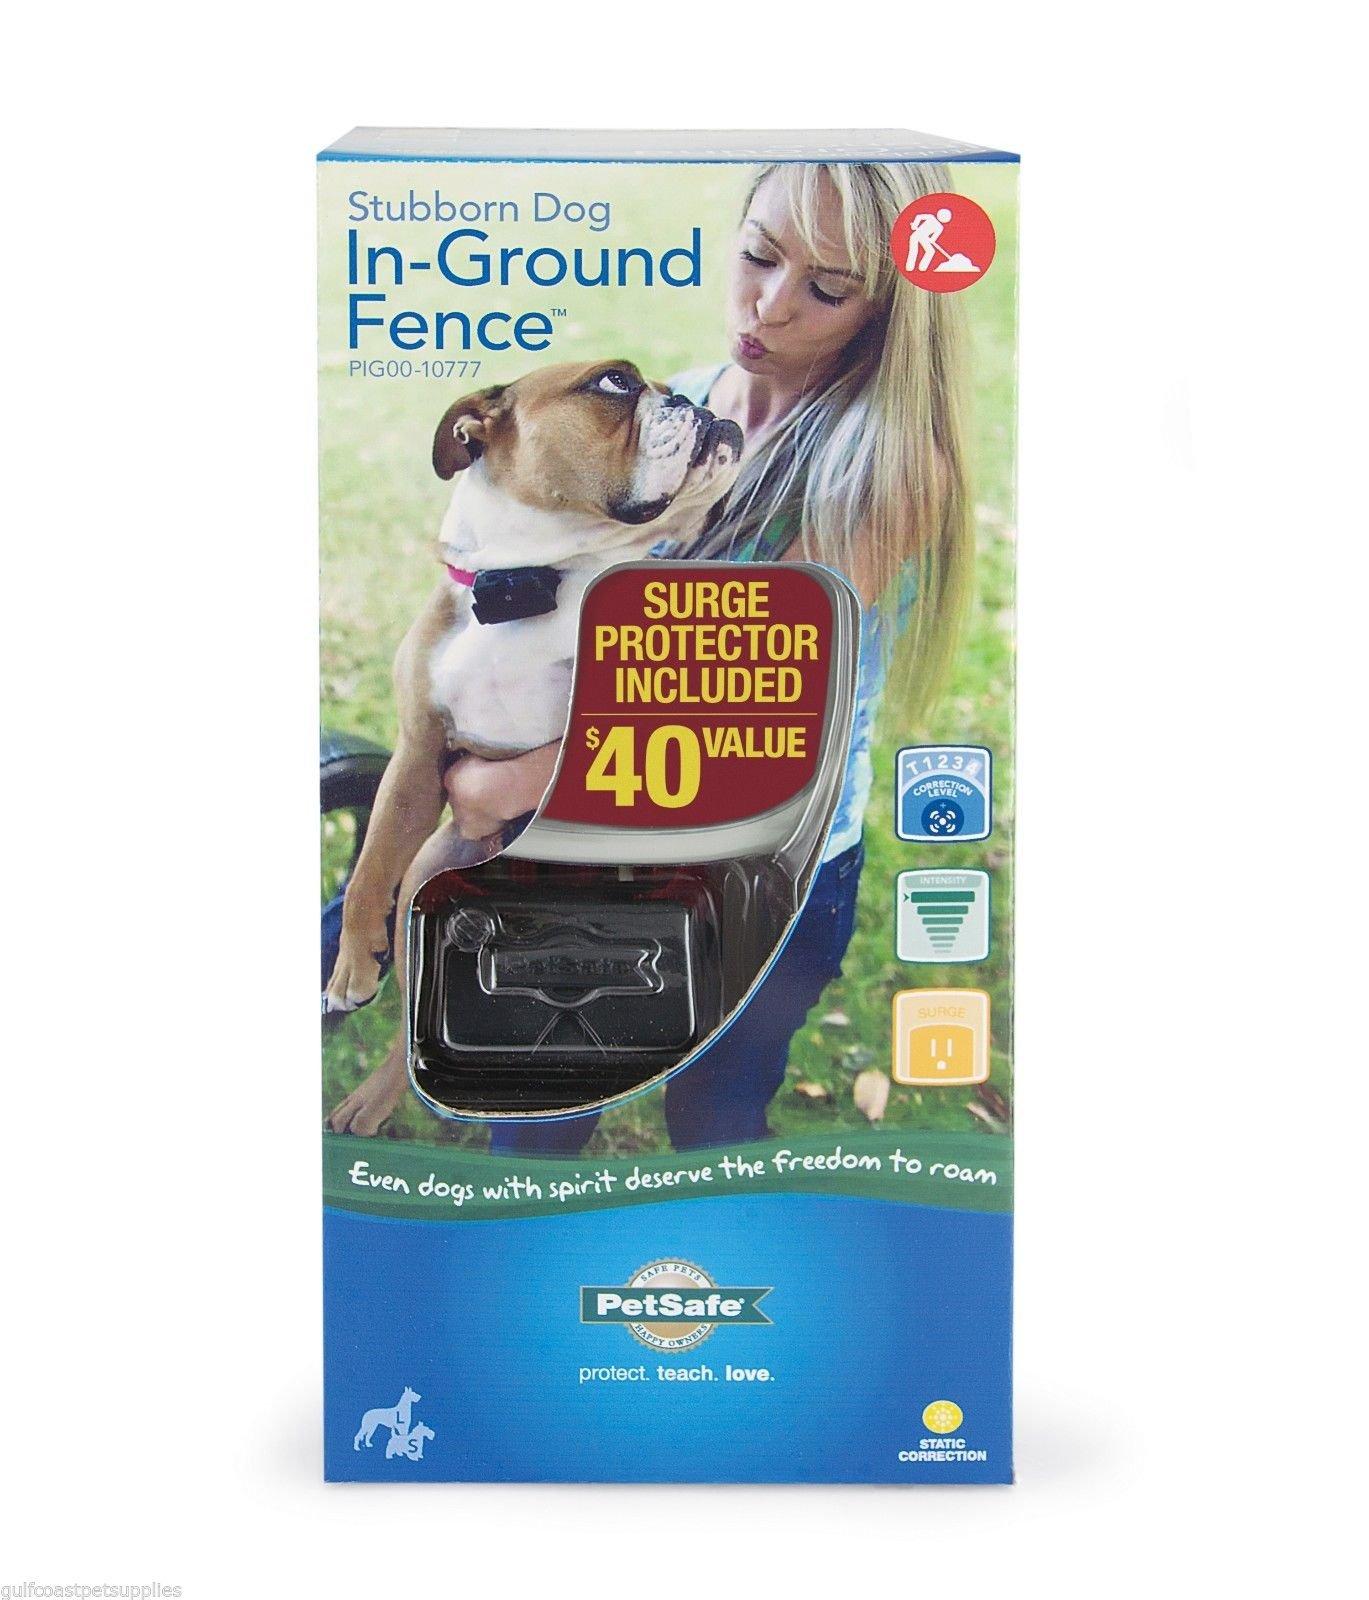 Petsafe Stubborn Dog Fence, 2-dog system PIG00-10777